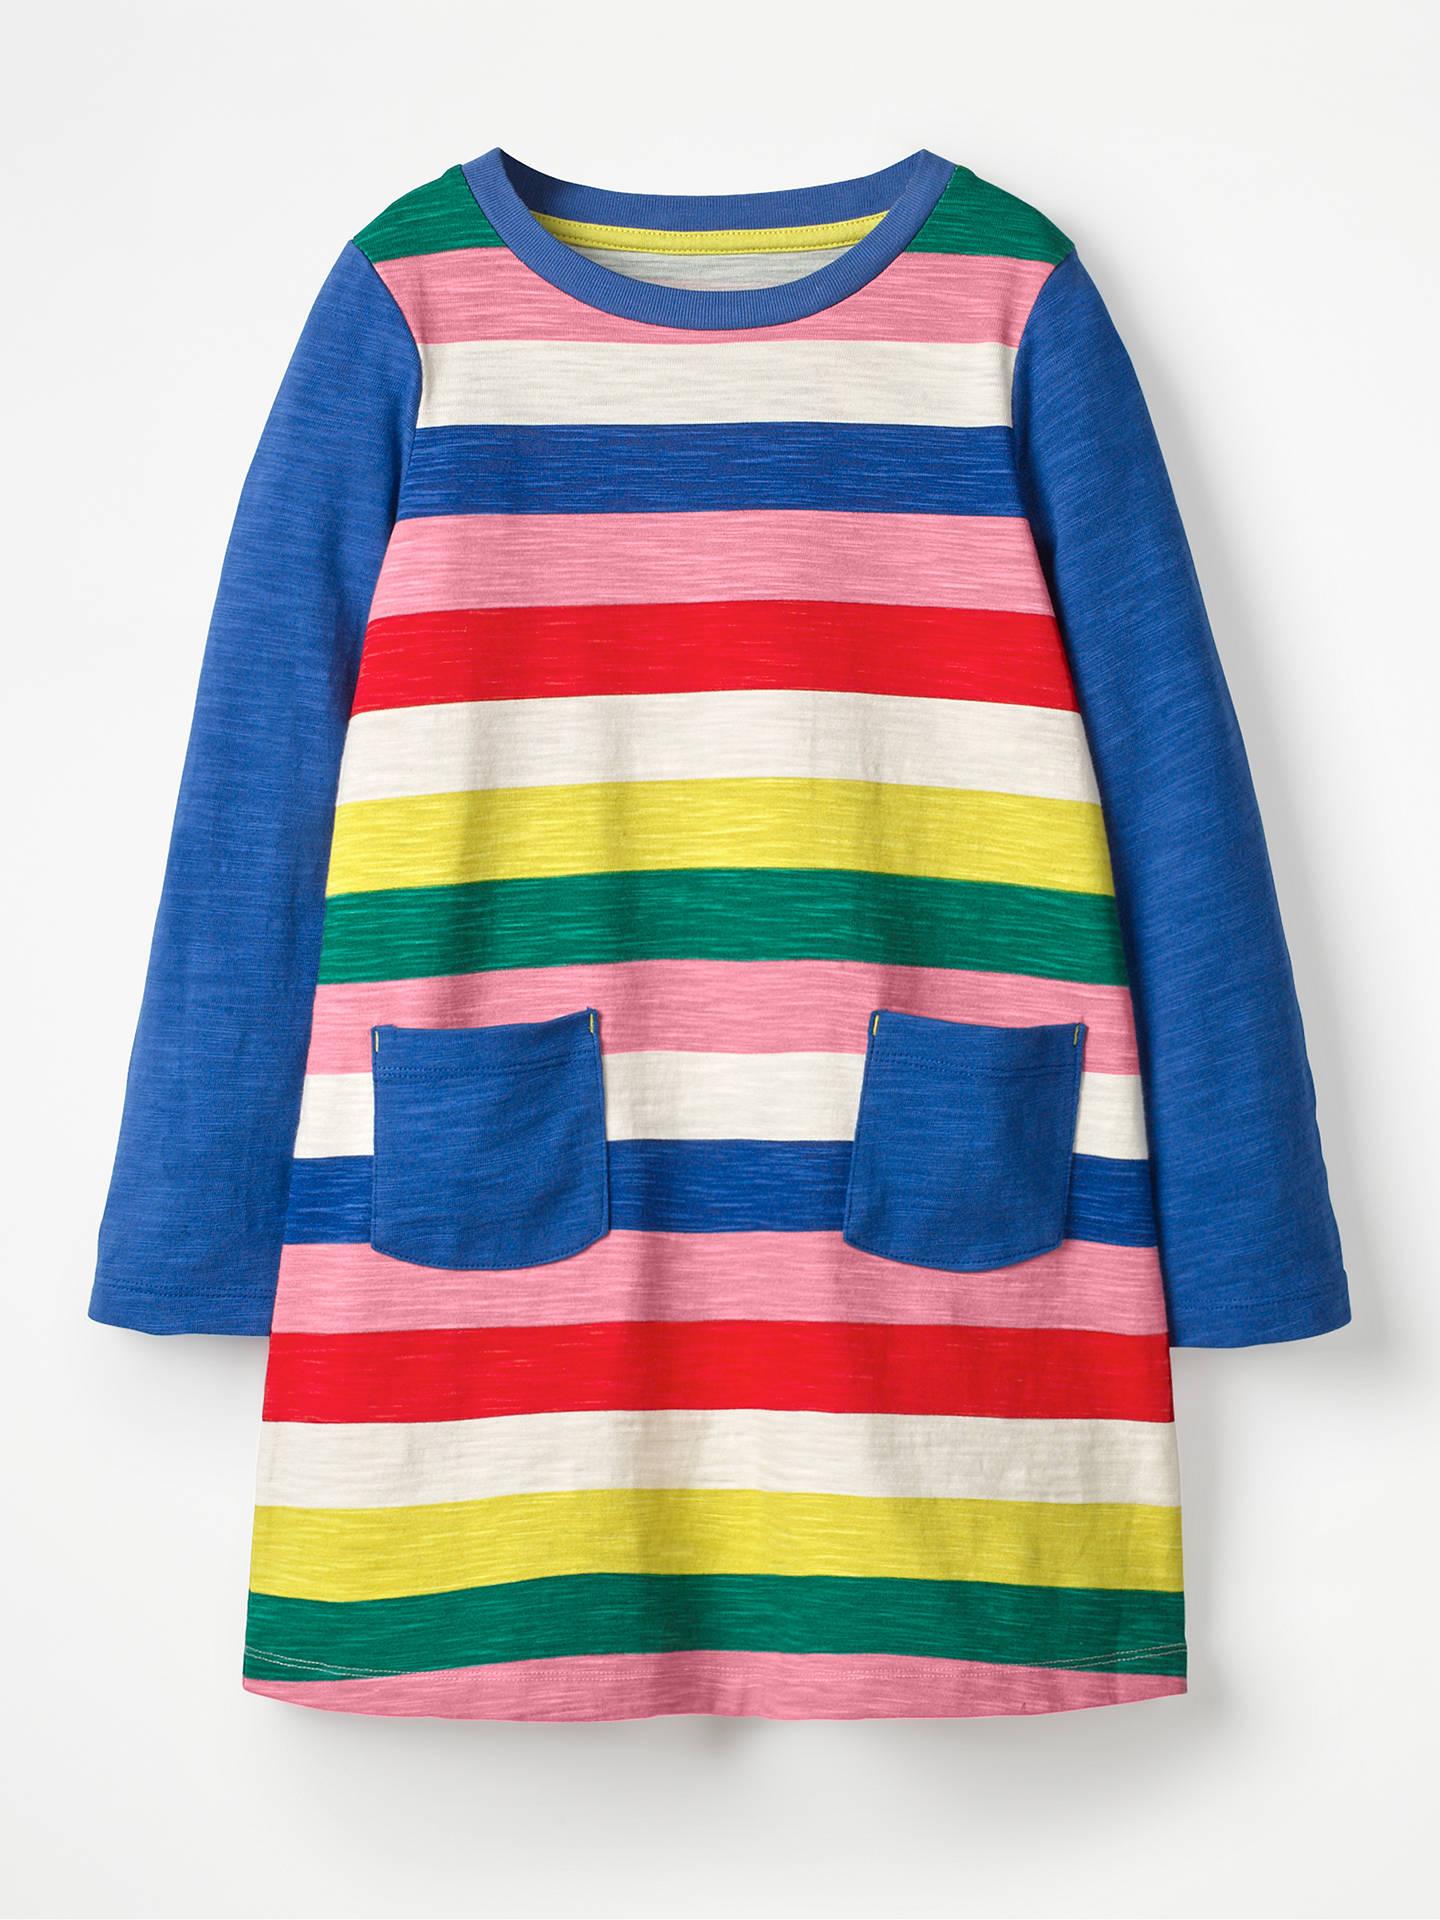 55c8465bc8b9 Buy Mini Boden Girls' Stripe Dress, Rainbow, 4-5 years Online at ...